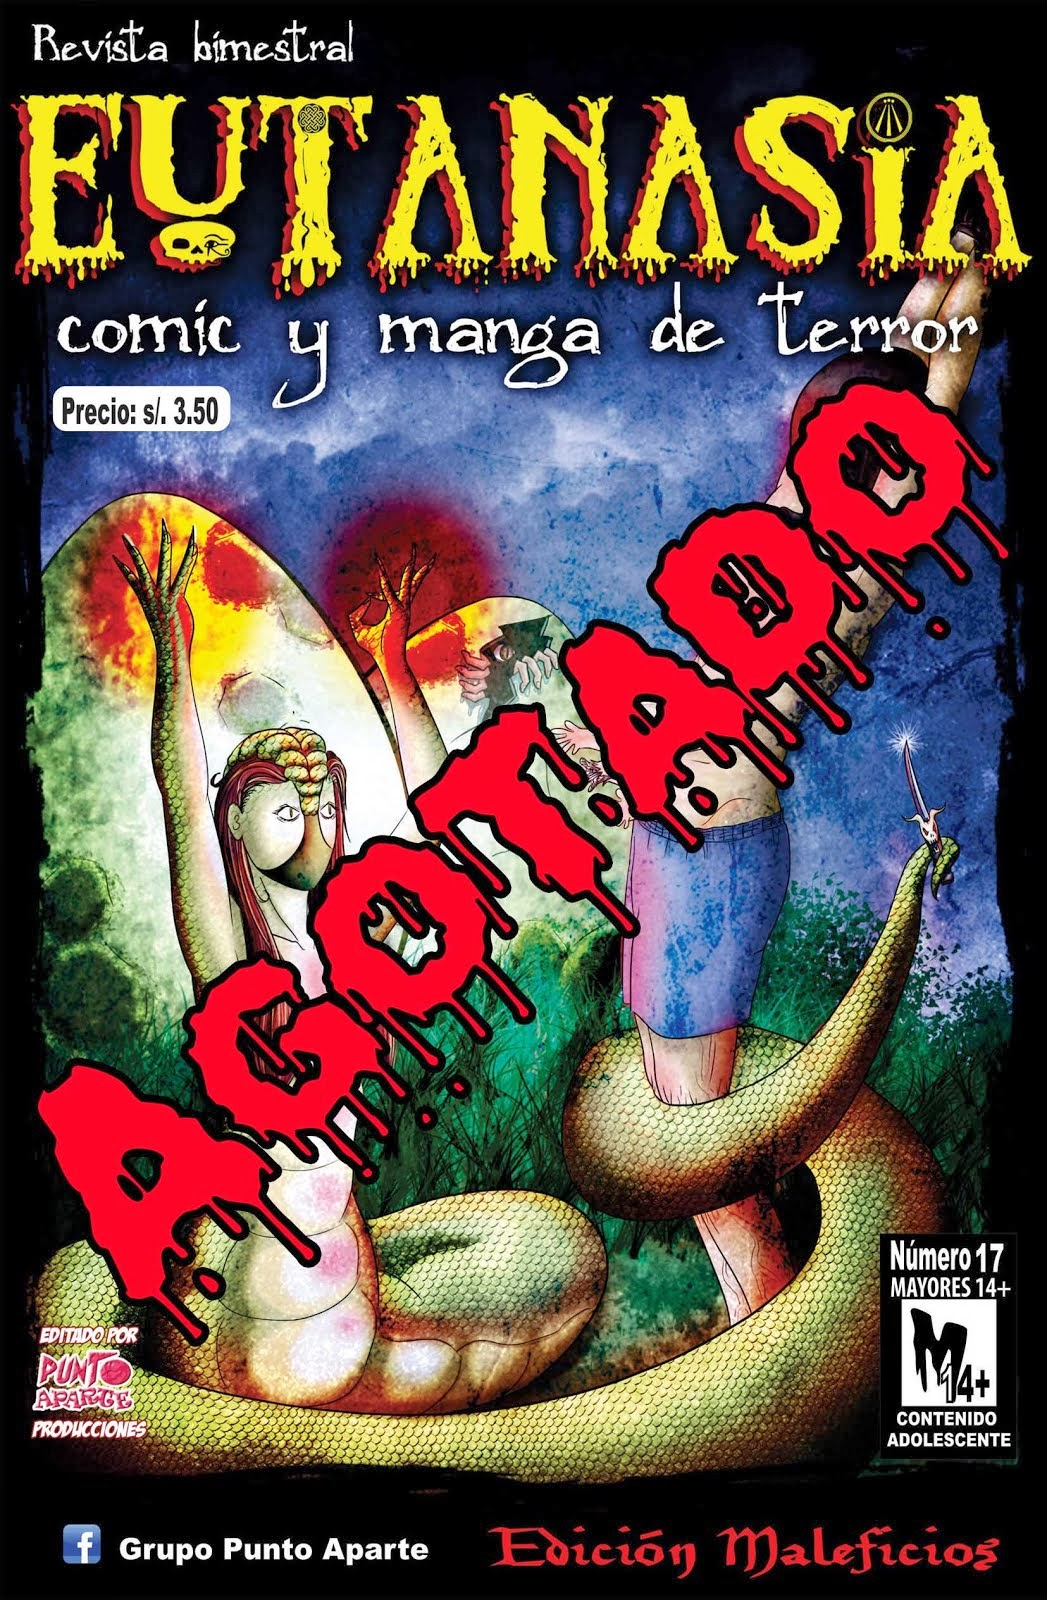 Eutanasia n°17 (edición maleficios) Enero 2012